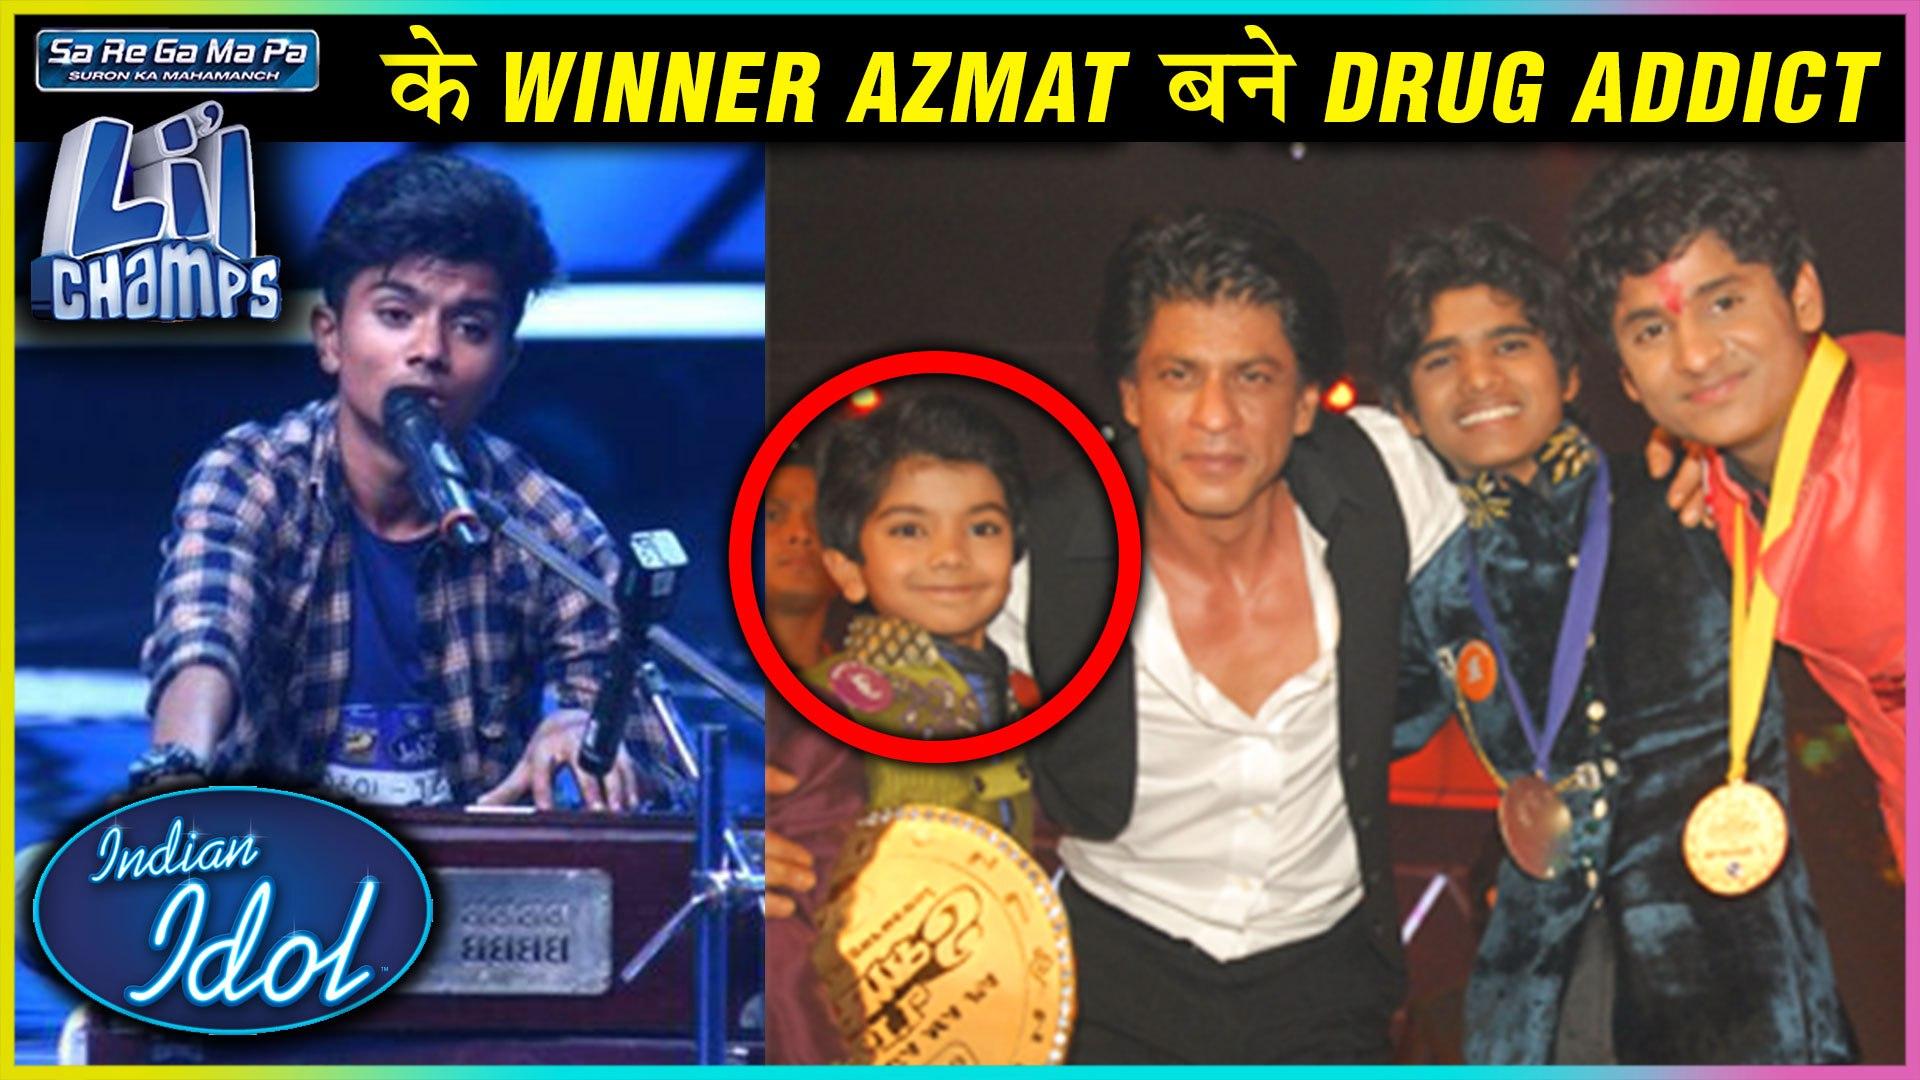 SAREGAMAPA Little Champs Winner Azmat Hussain's Depression & Drugs Addiction Story   Indian